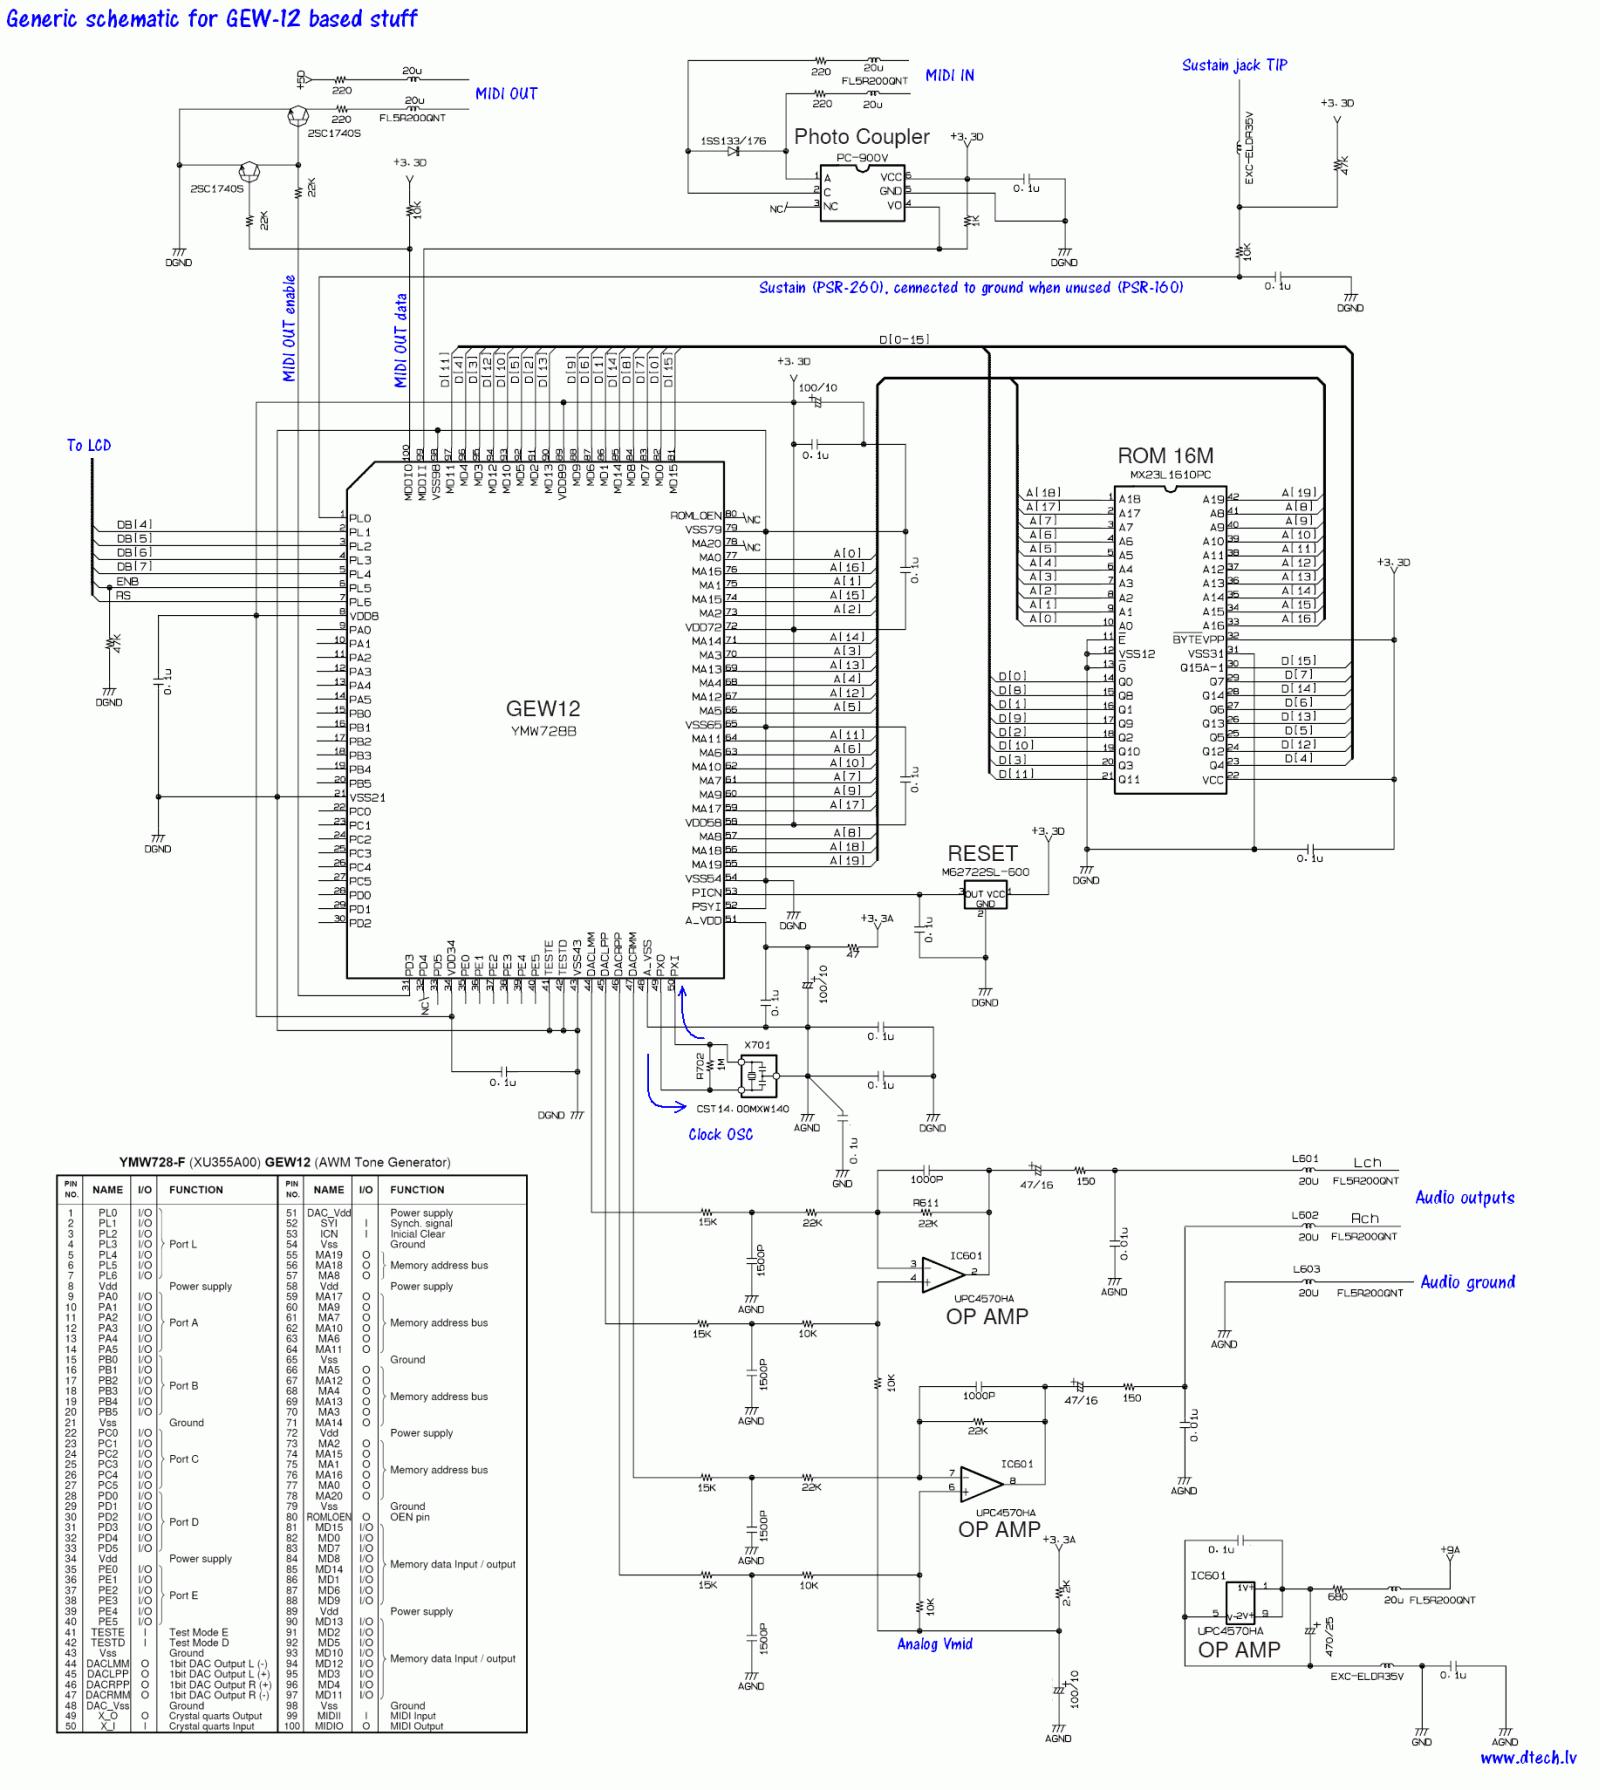 Kitchenaid Wiring Diagram Whirlpool Gold Dishwasher Superba Ice Maker View Large